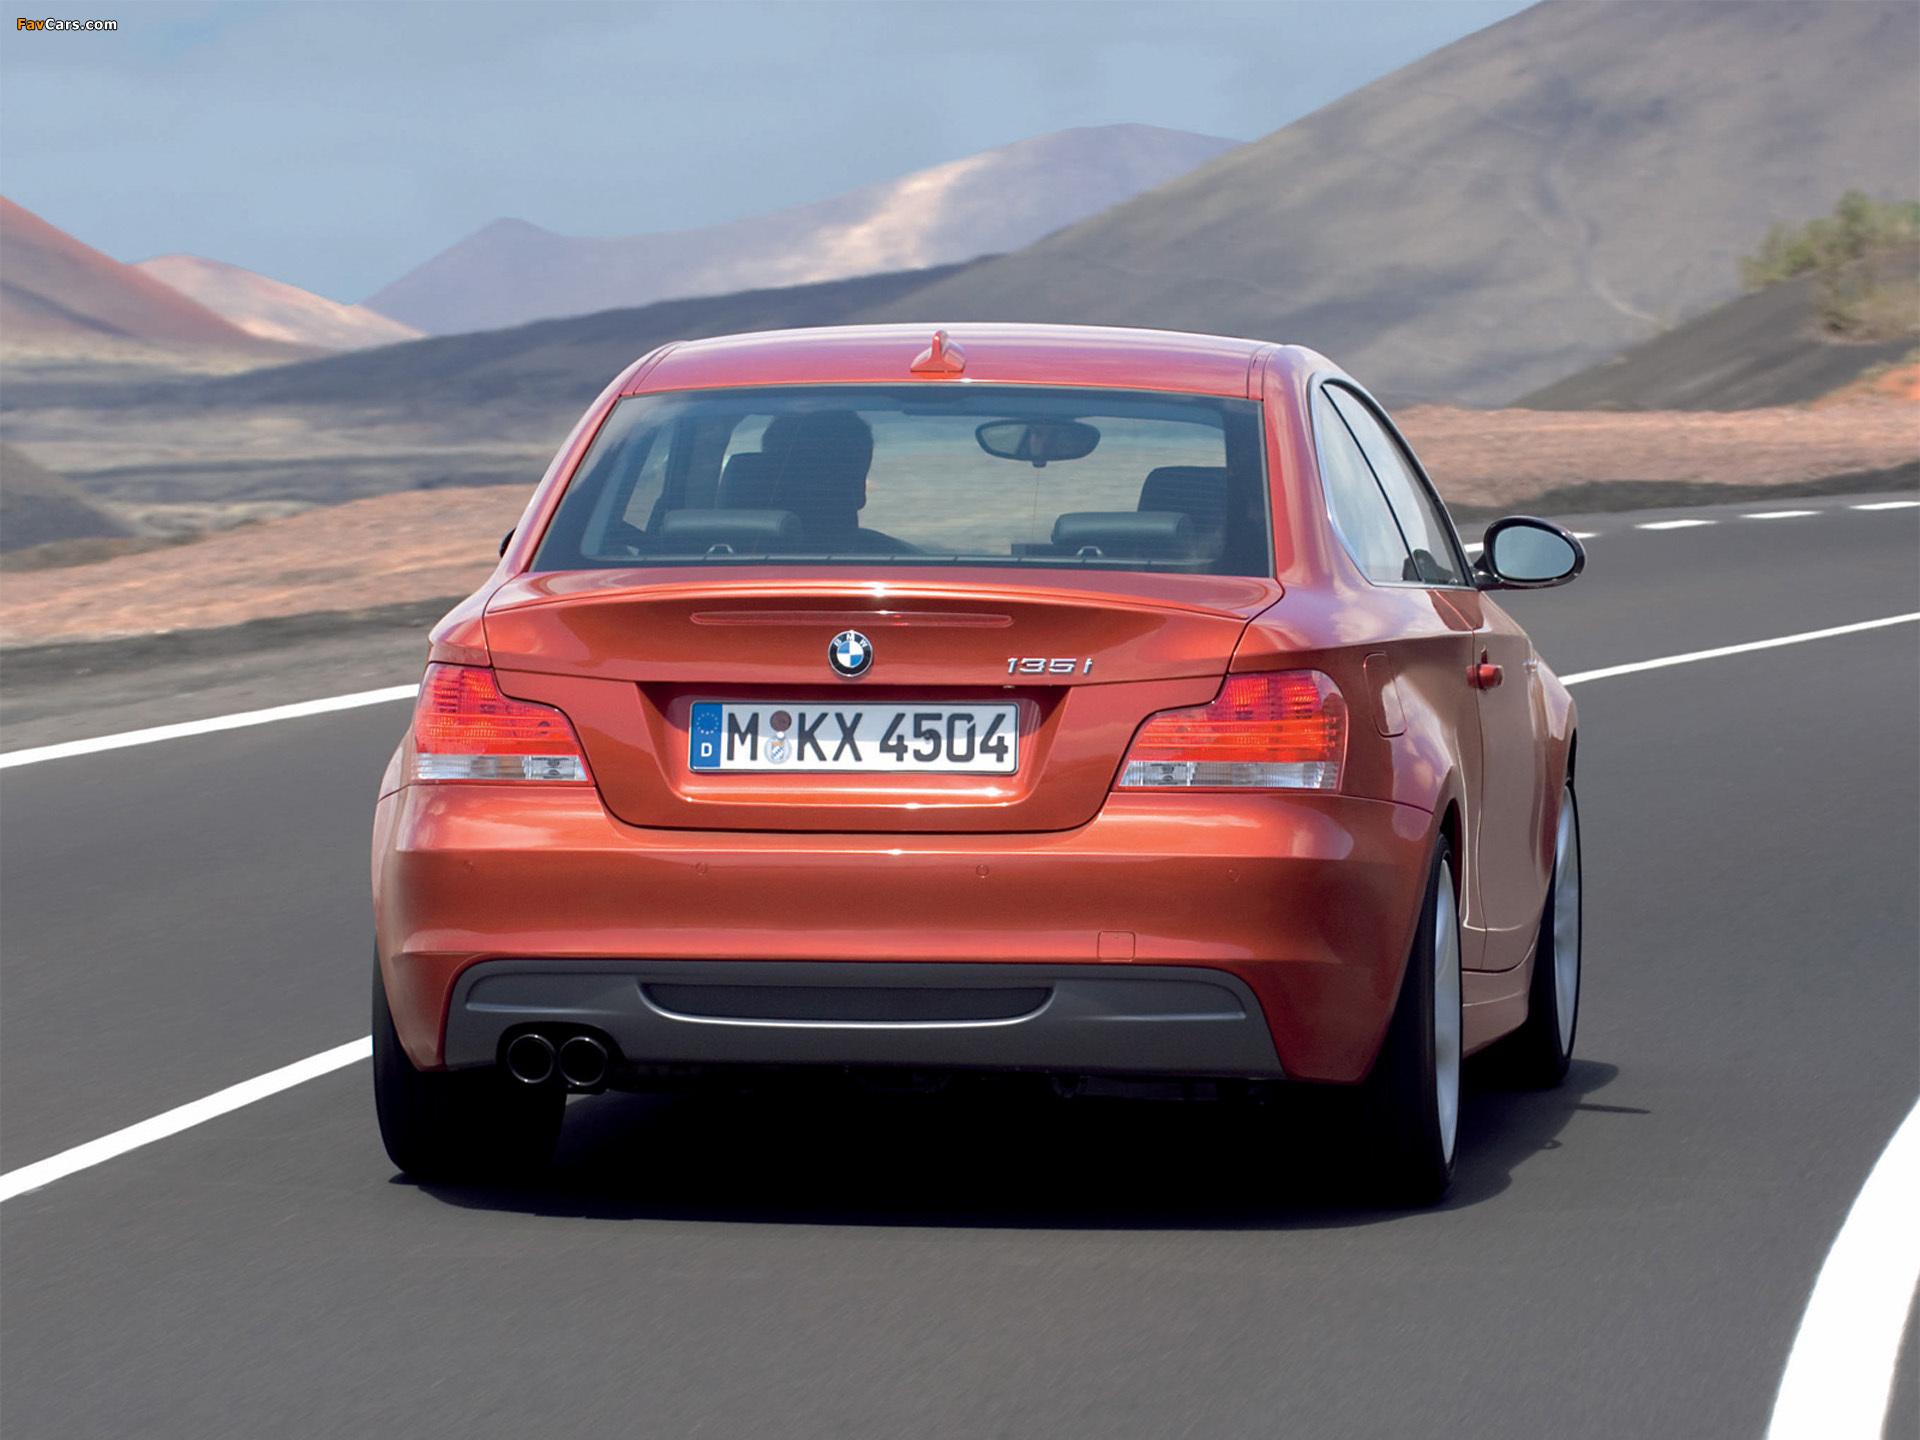 Bmw 135i coupe rear aride бесплатно